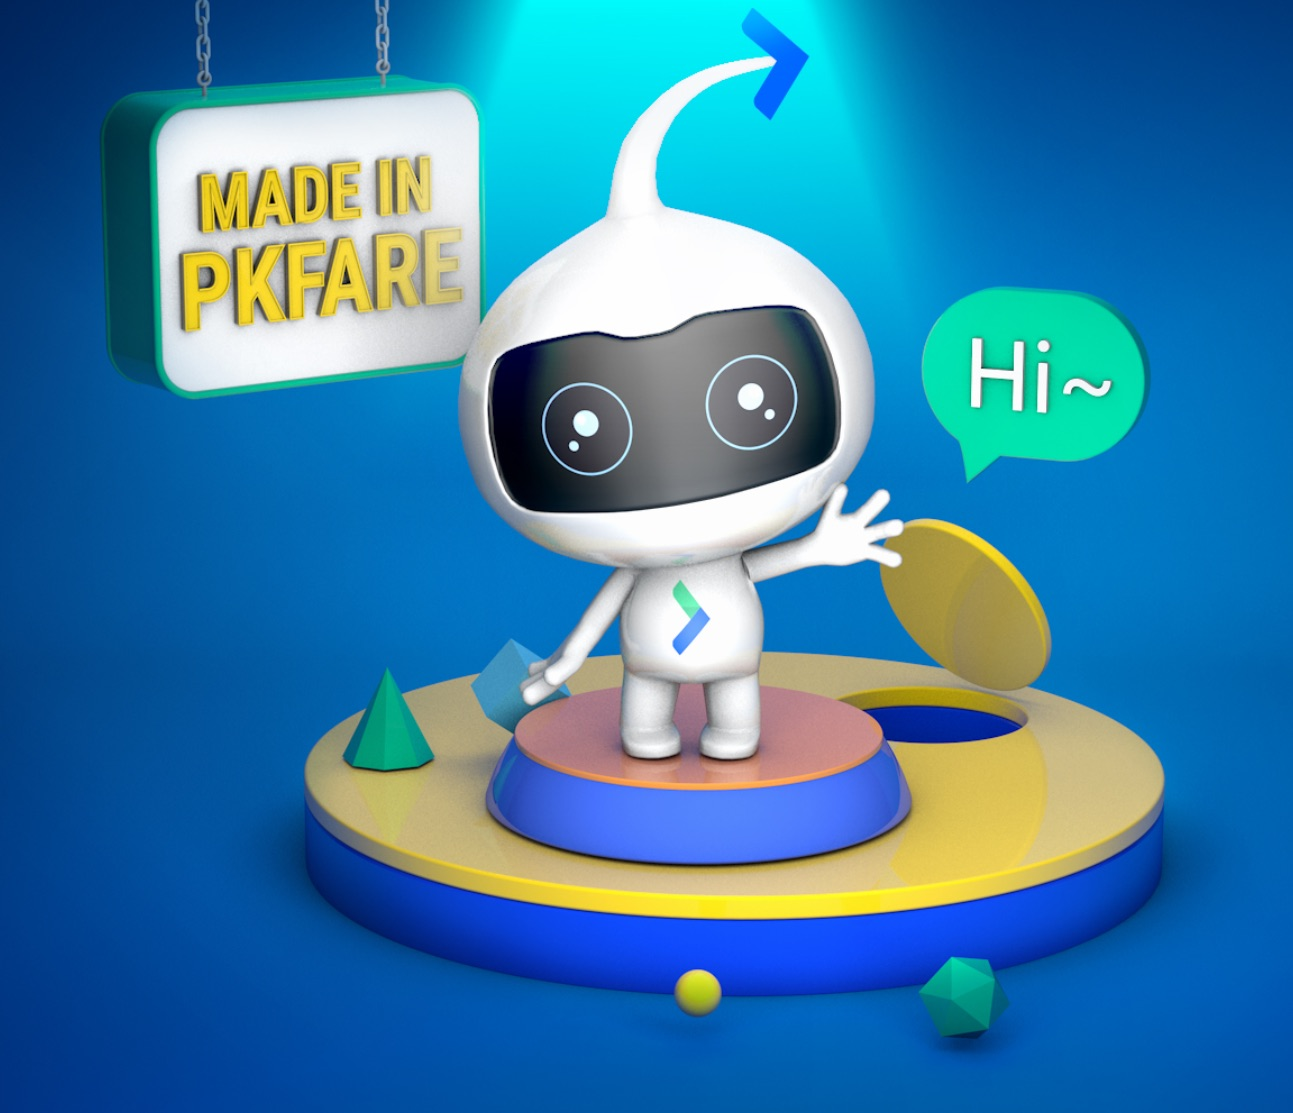 PKFARE:开启全球旅游B2B人工智能咨询模式